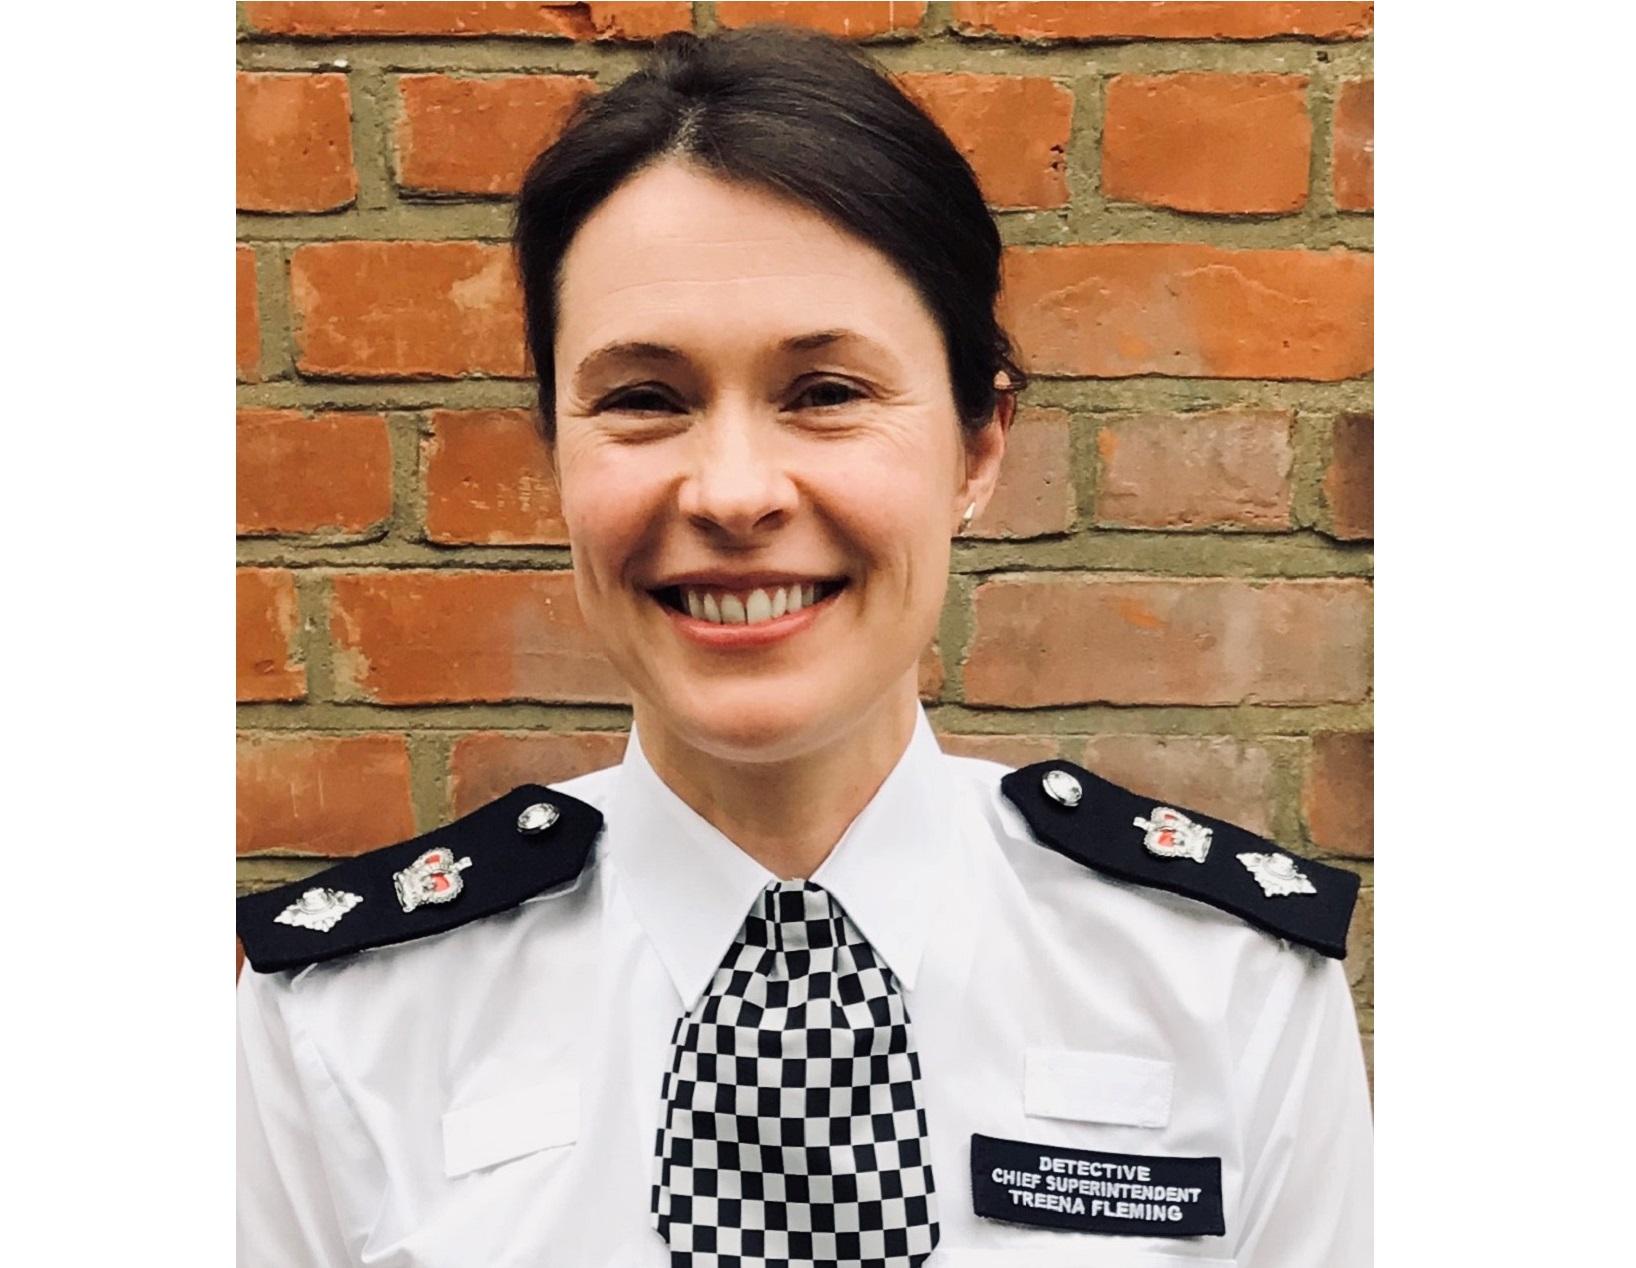 Detective Chief Superintendent Treena Fleming